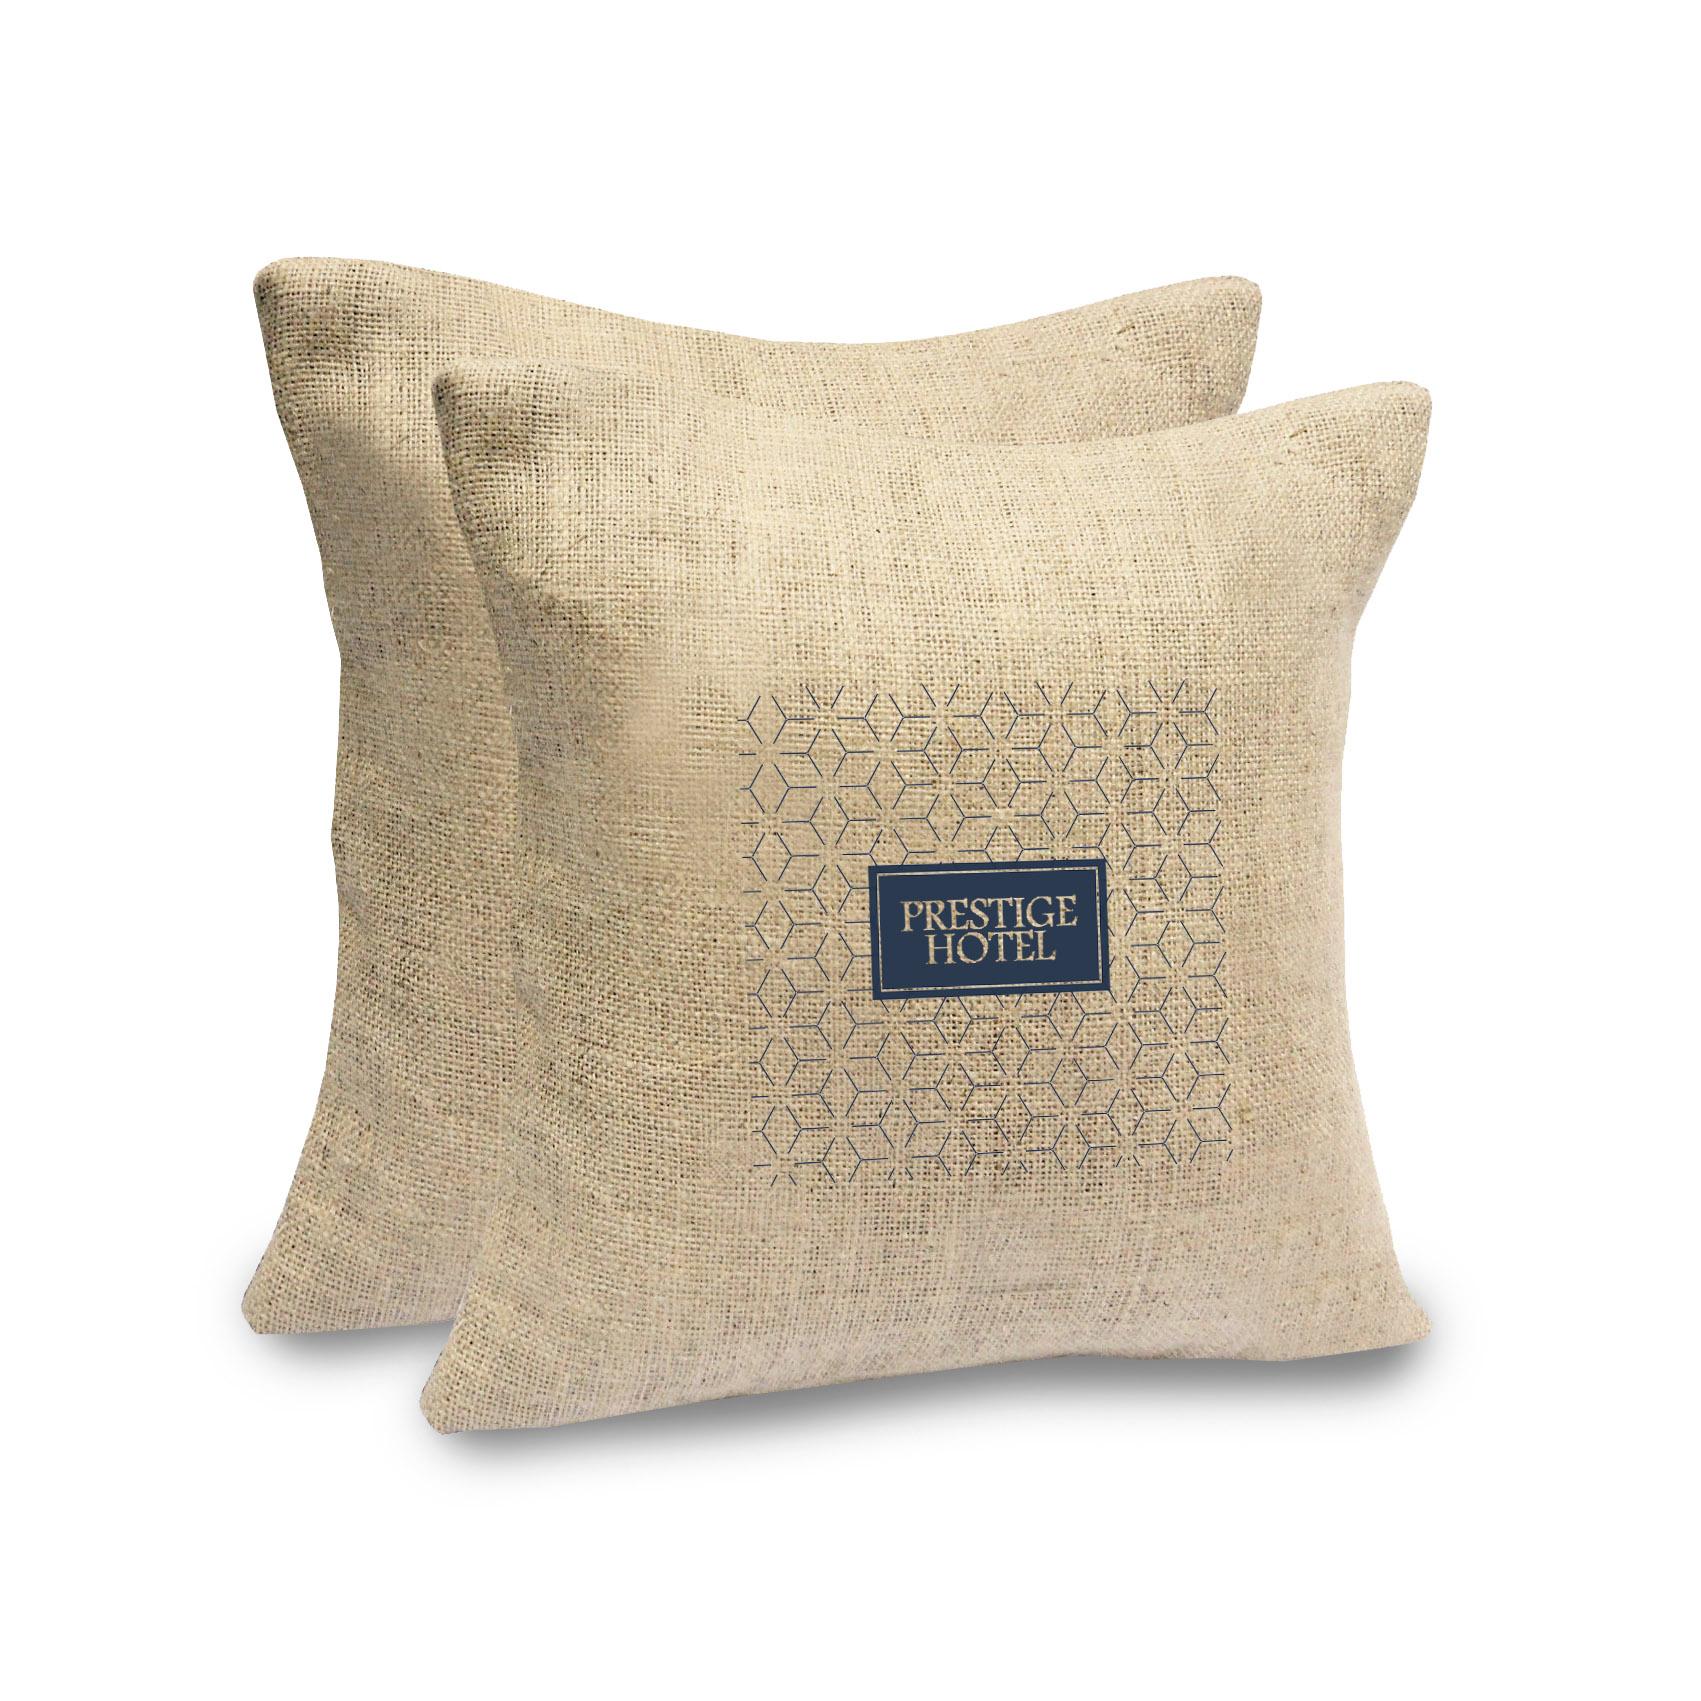 Hemp Cushion Cover For An Environment Friendly Decoration ...